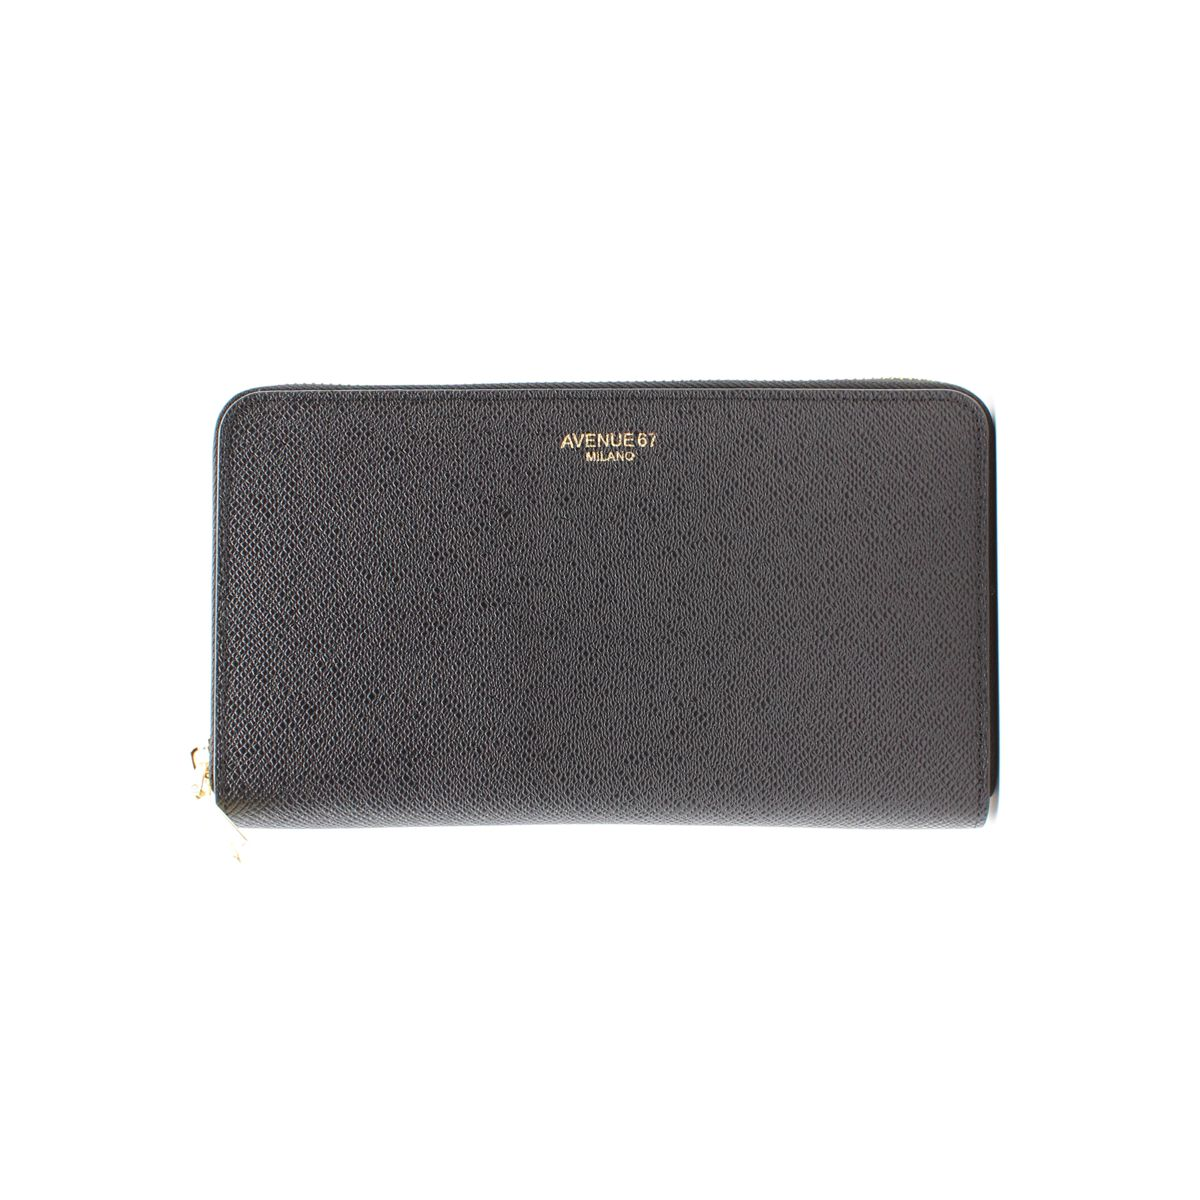 Woman wallet Black Avenue 67